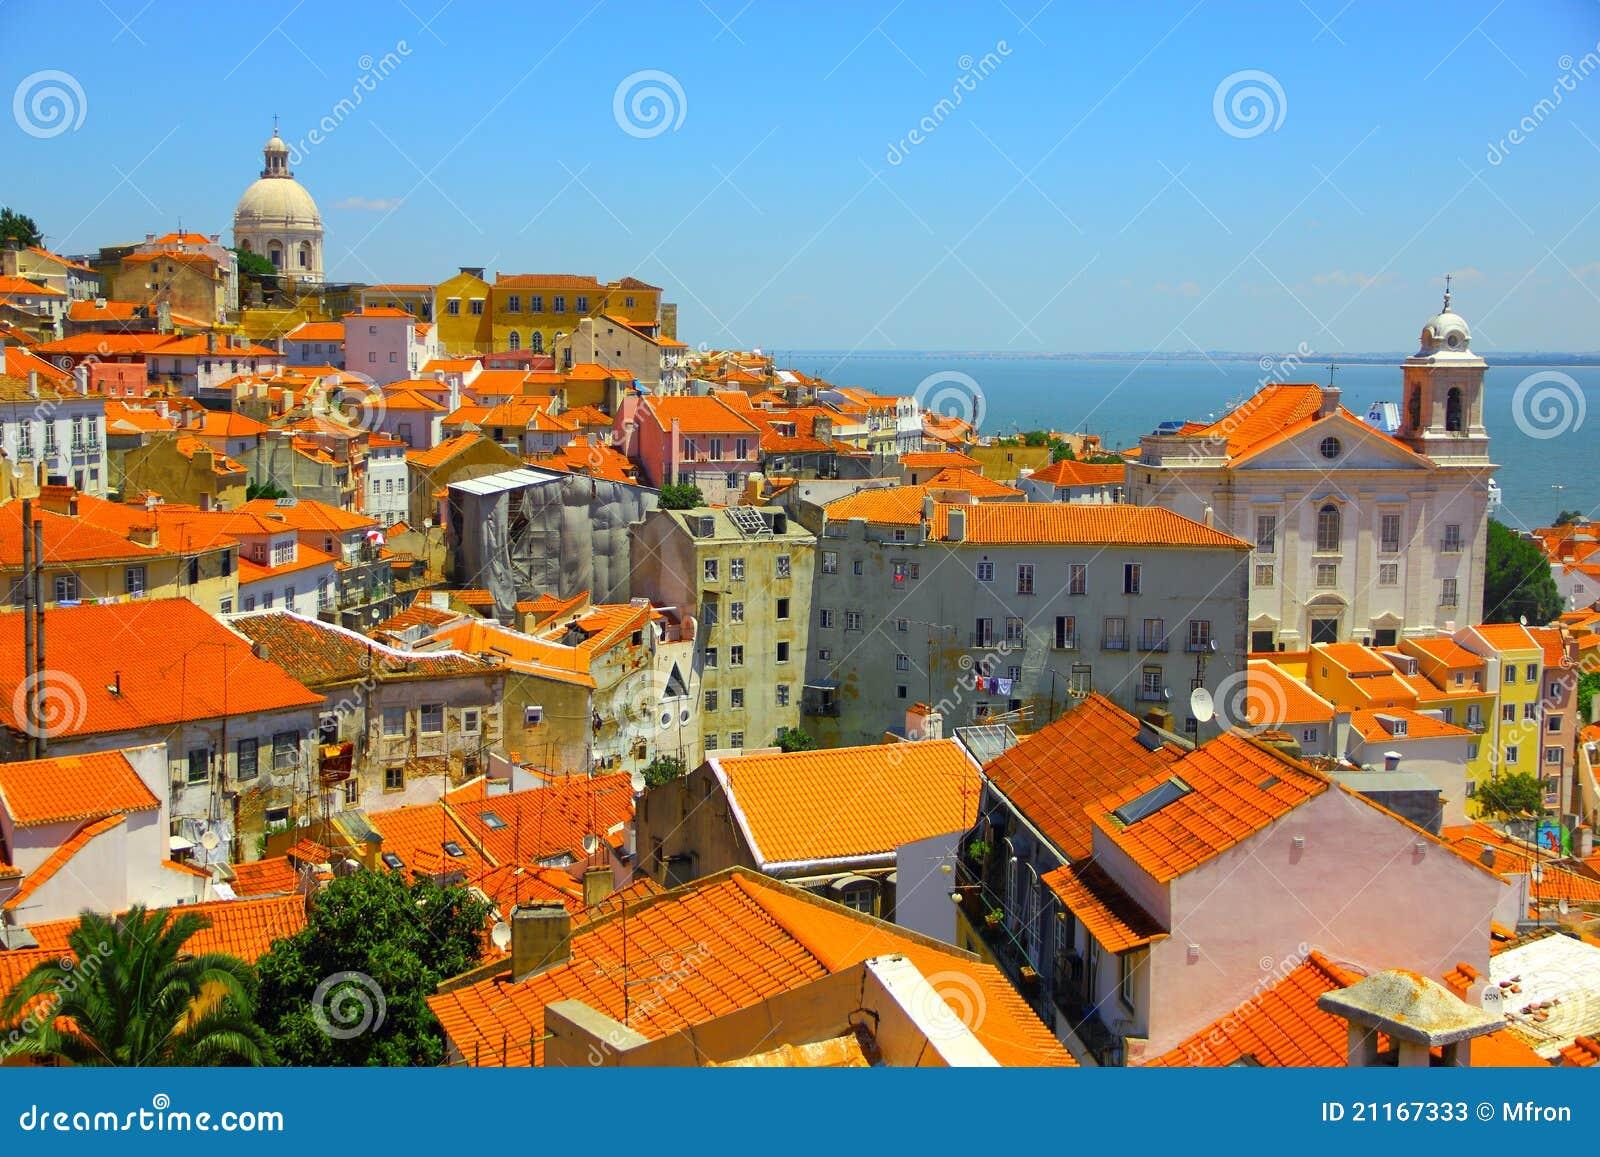 lissabon alte stadt portugal stockfotos bild 21167333. Black Bedroom Furniture Sets. Home Design Ideas